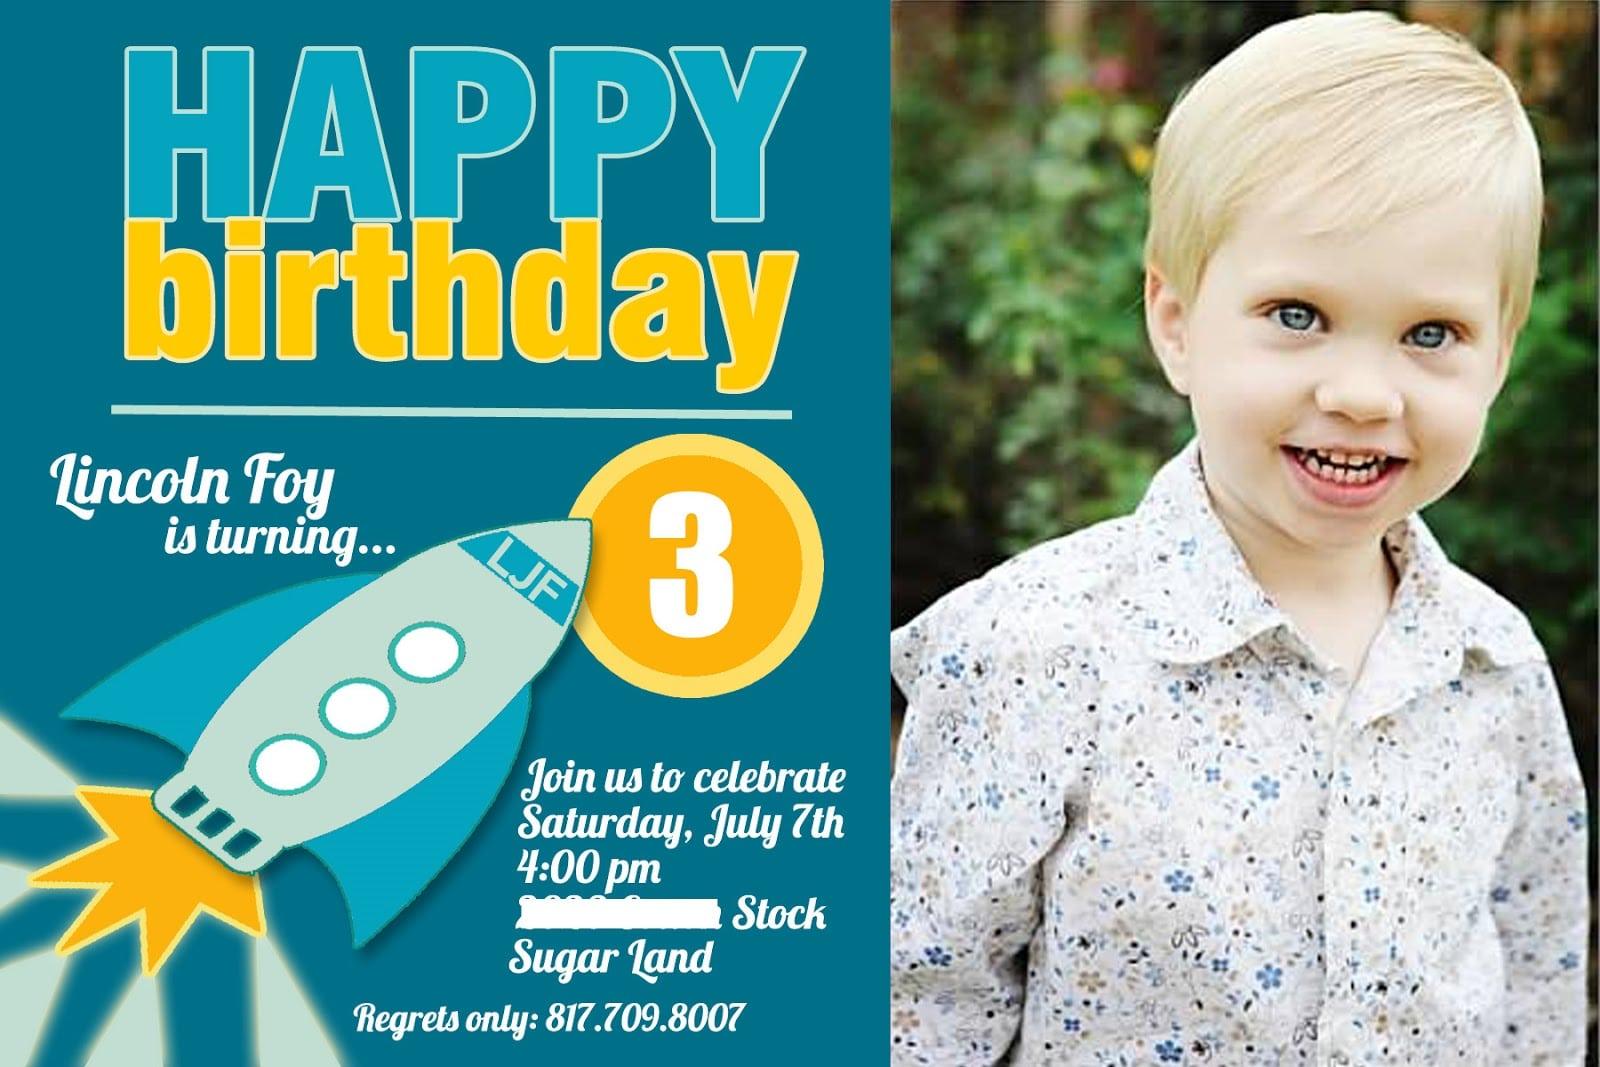 Birthday Invitation Wording For 5 Year Old